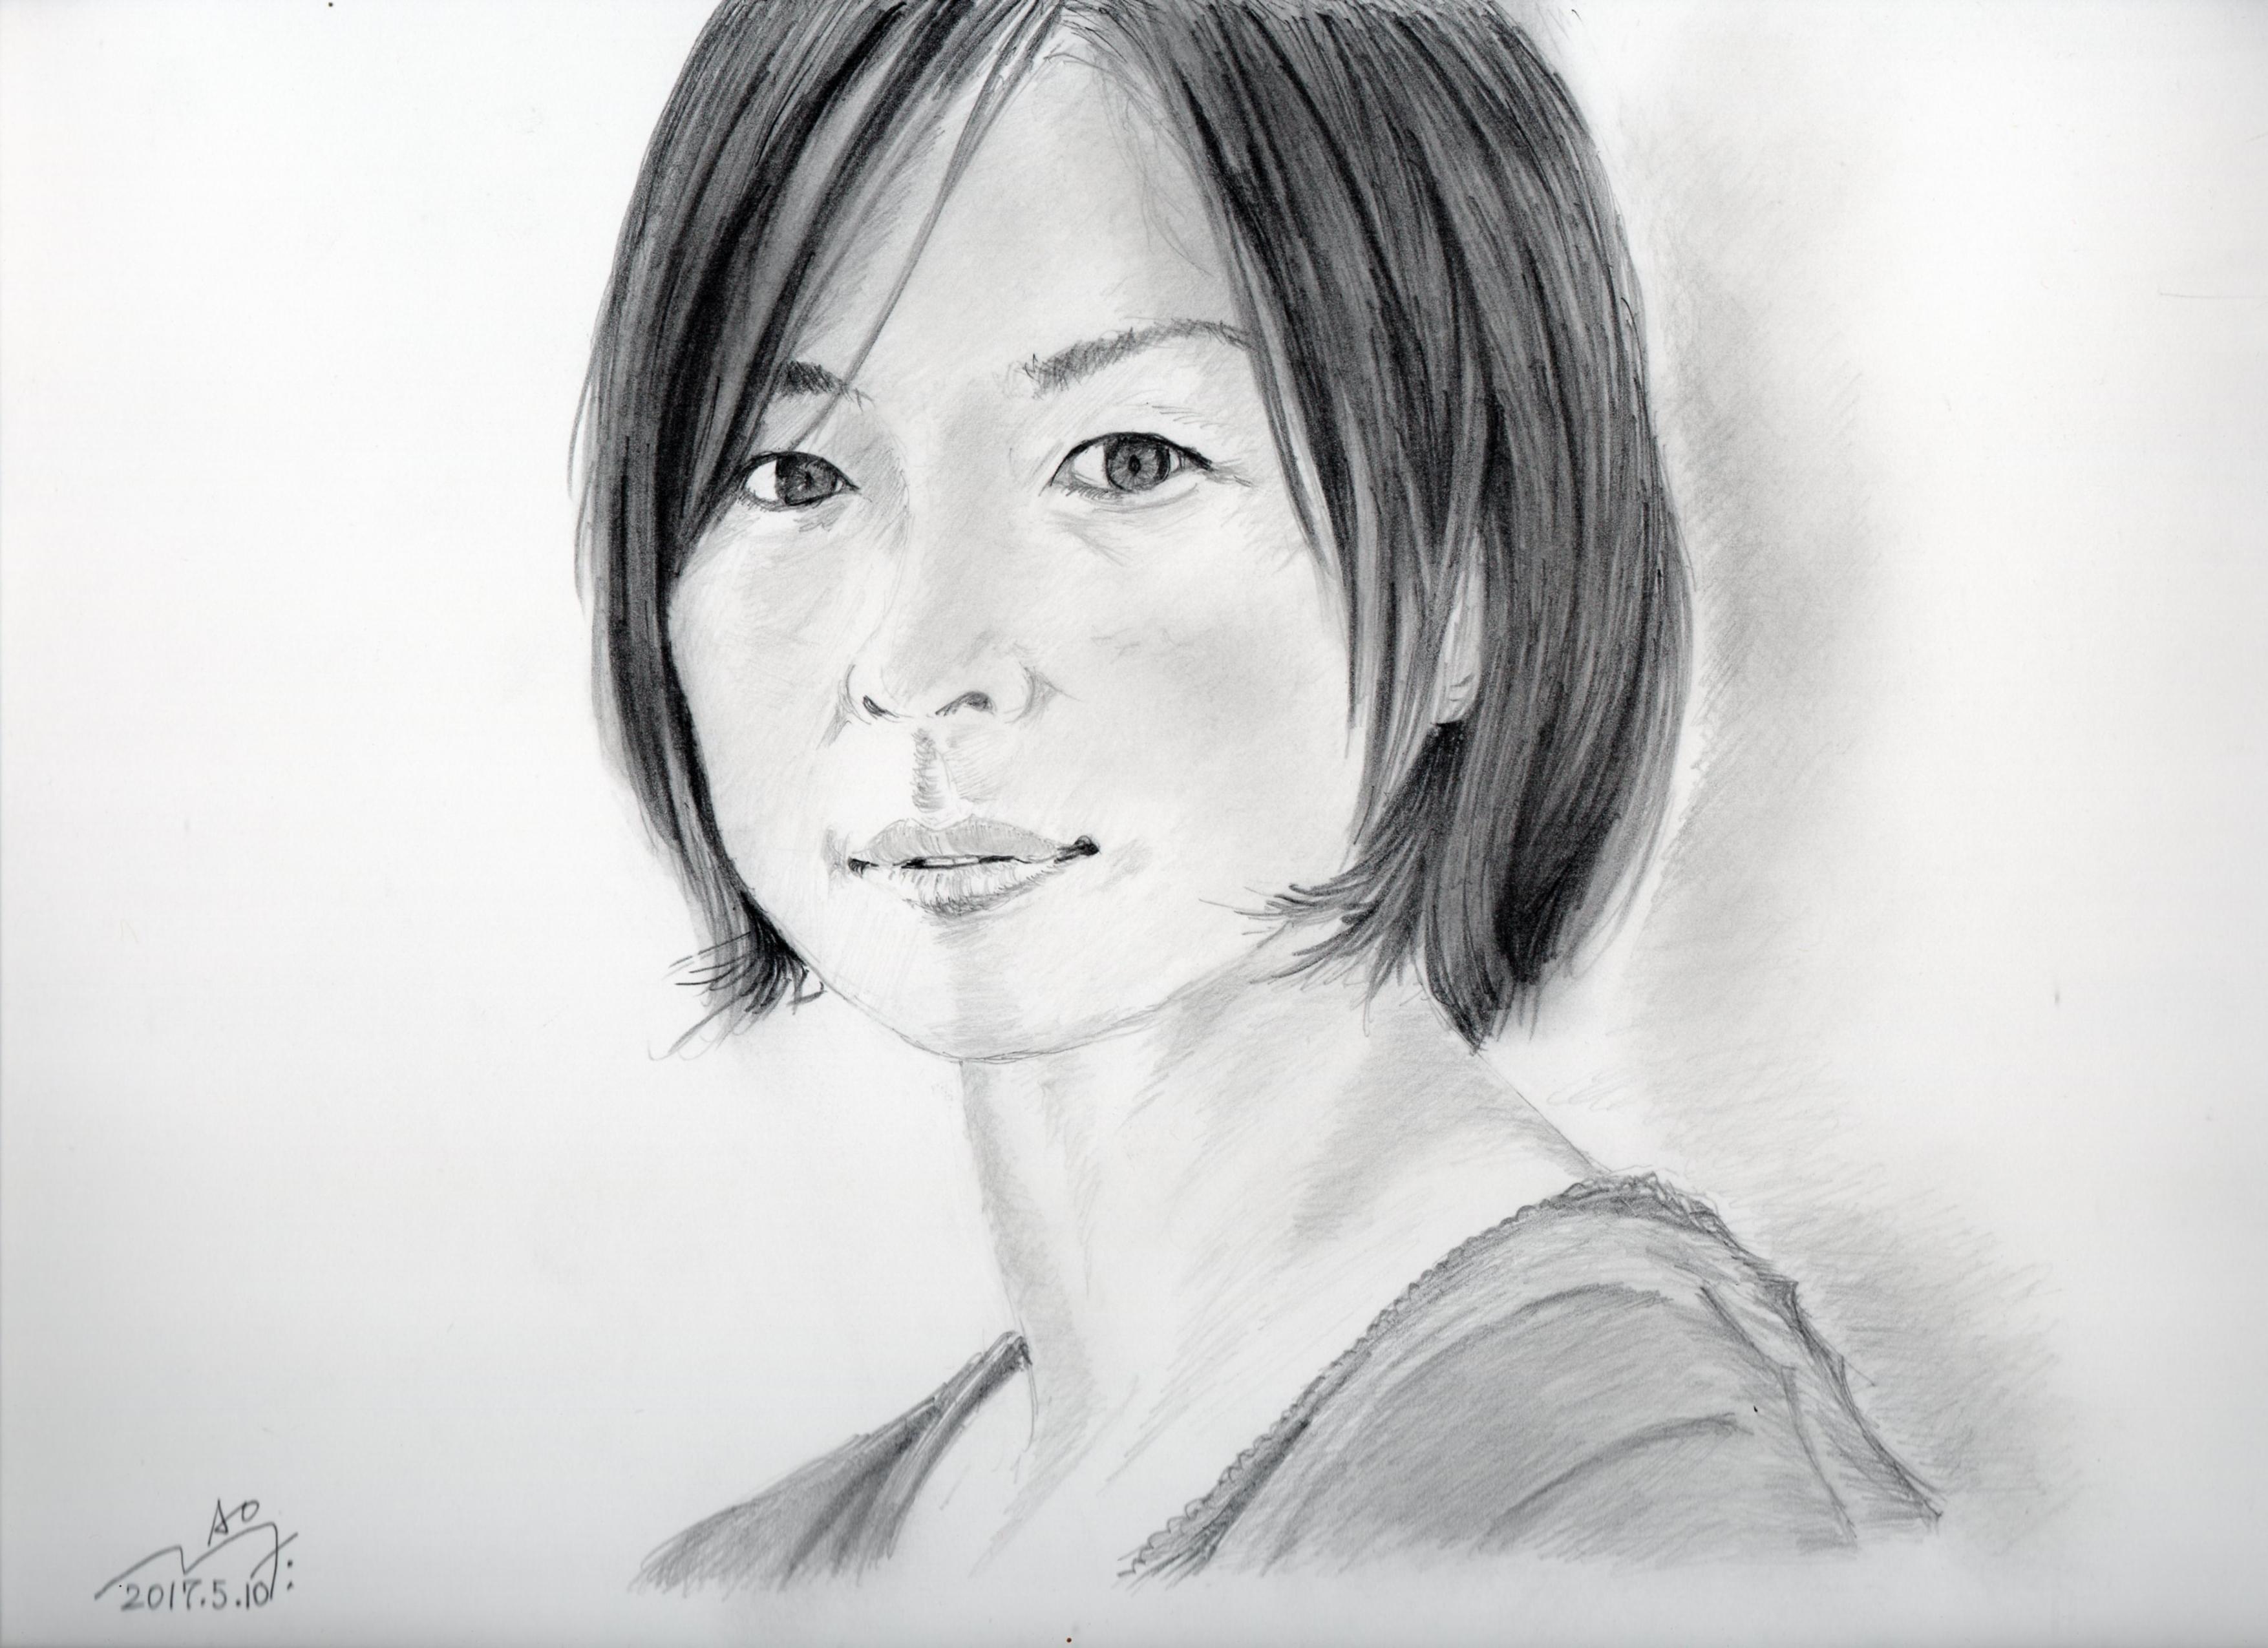 平岩紙の鉛筆画似顔絵